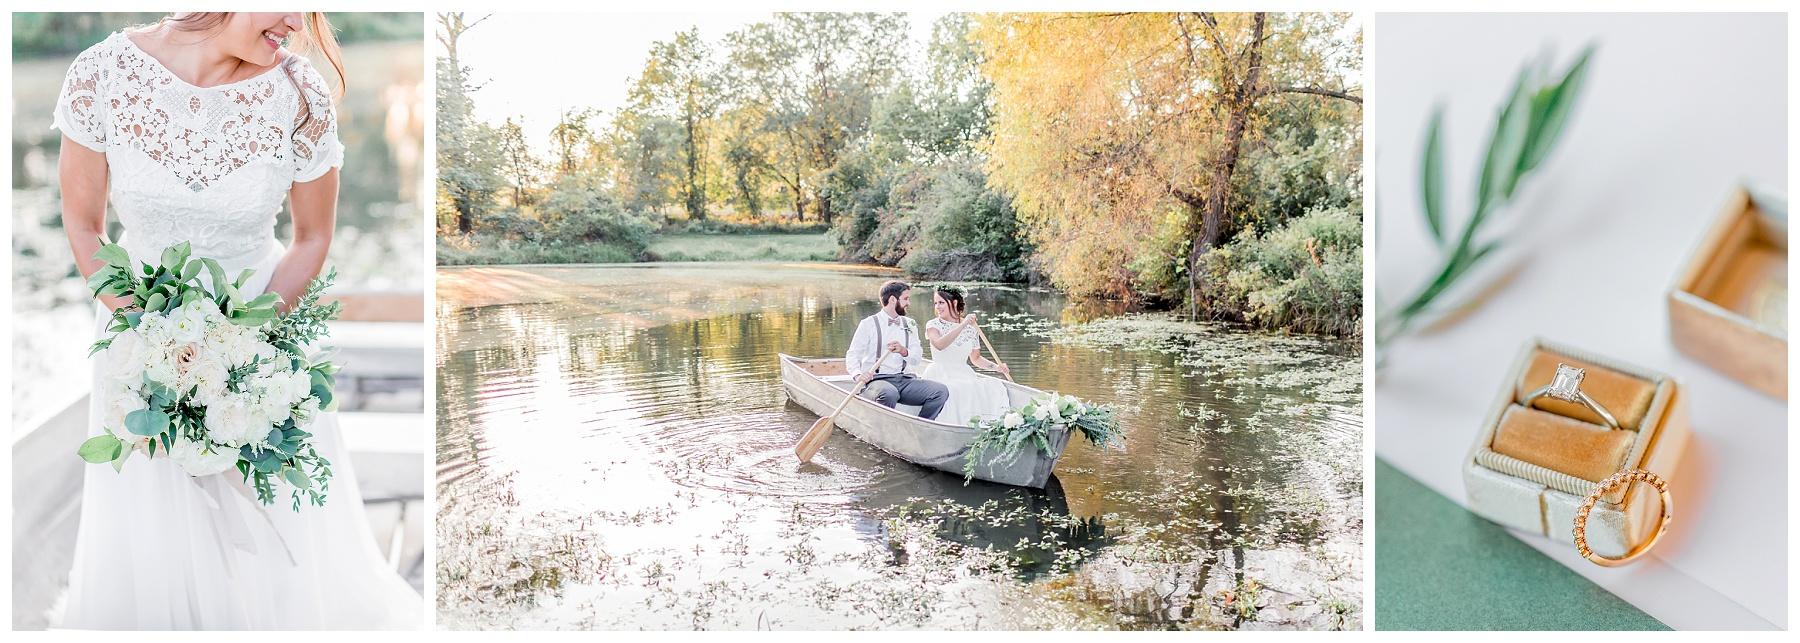 Kansas-City-KC-Wedding-Photographer-Elizabeth-Ladean-Photography-photo-_6239.jpg